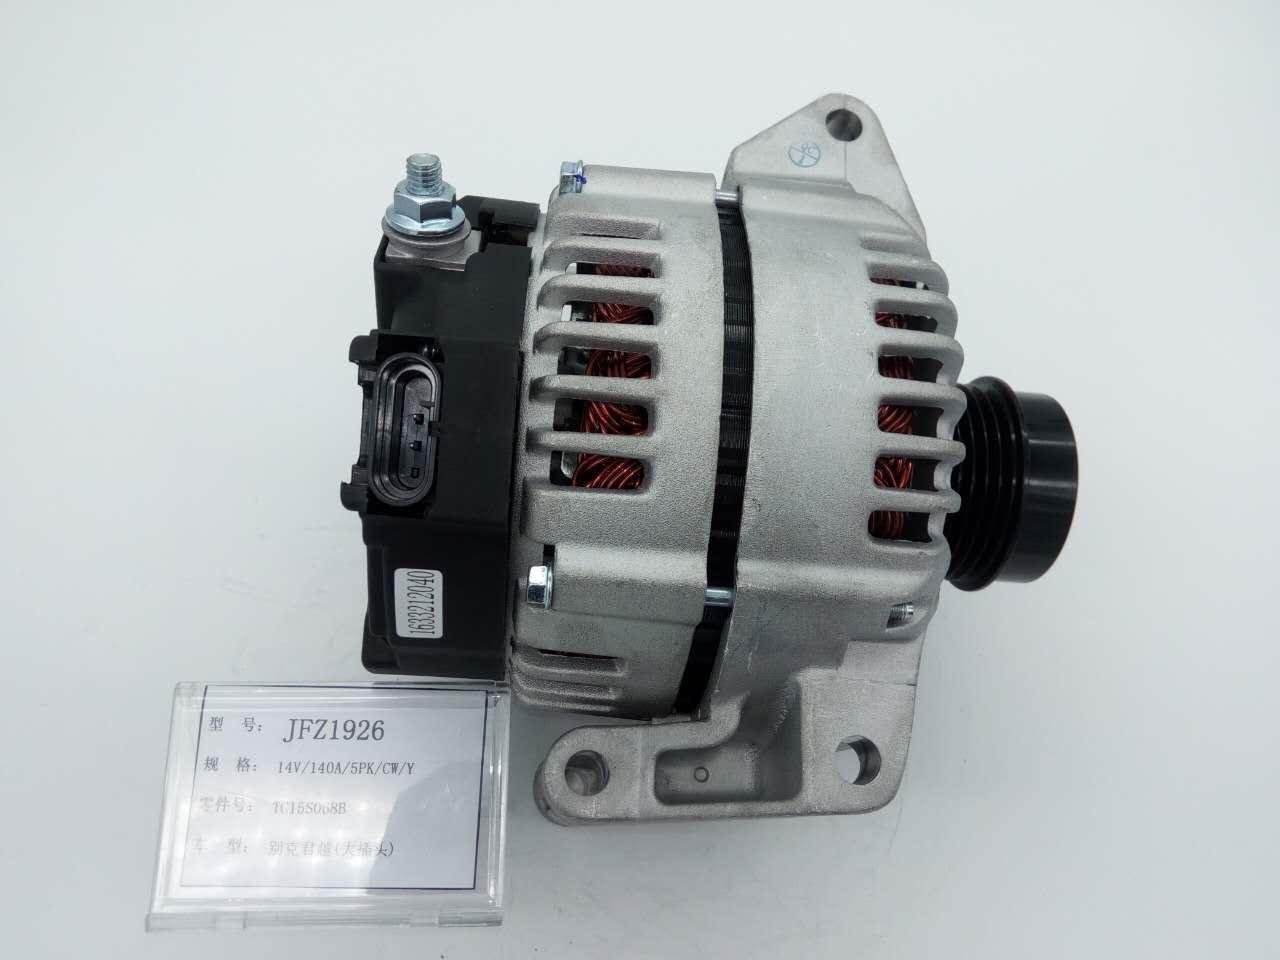 Buick alternator TC15S068B SD14002